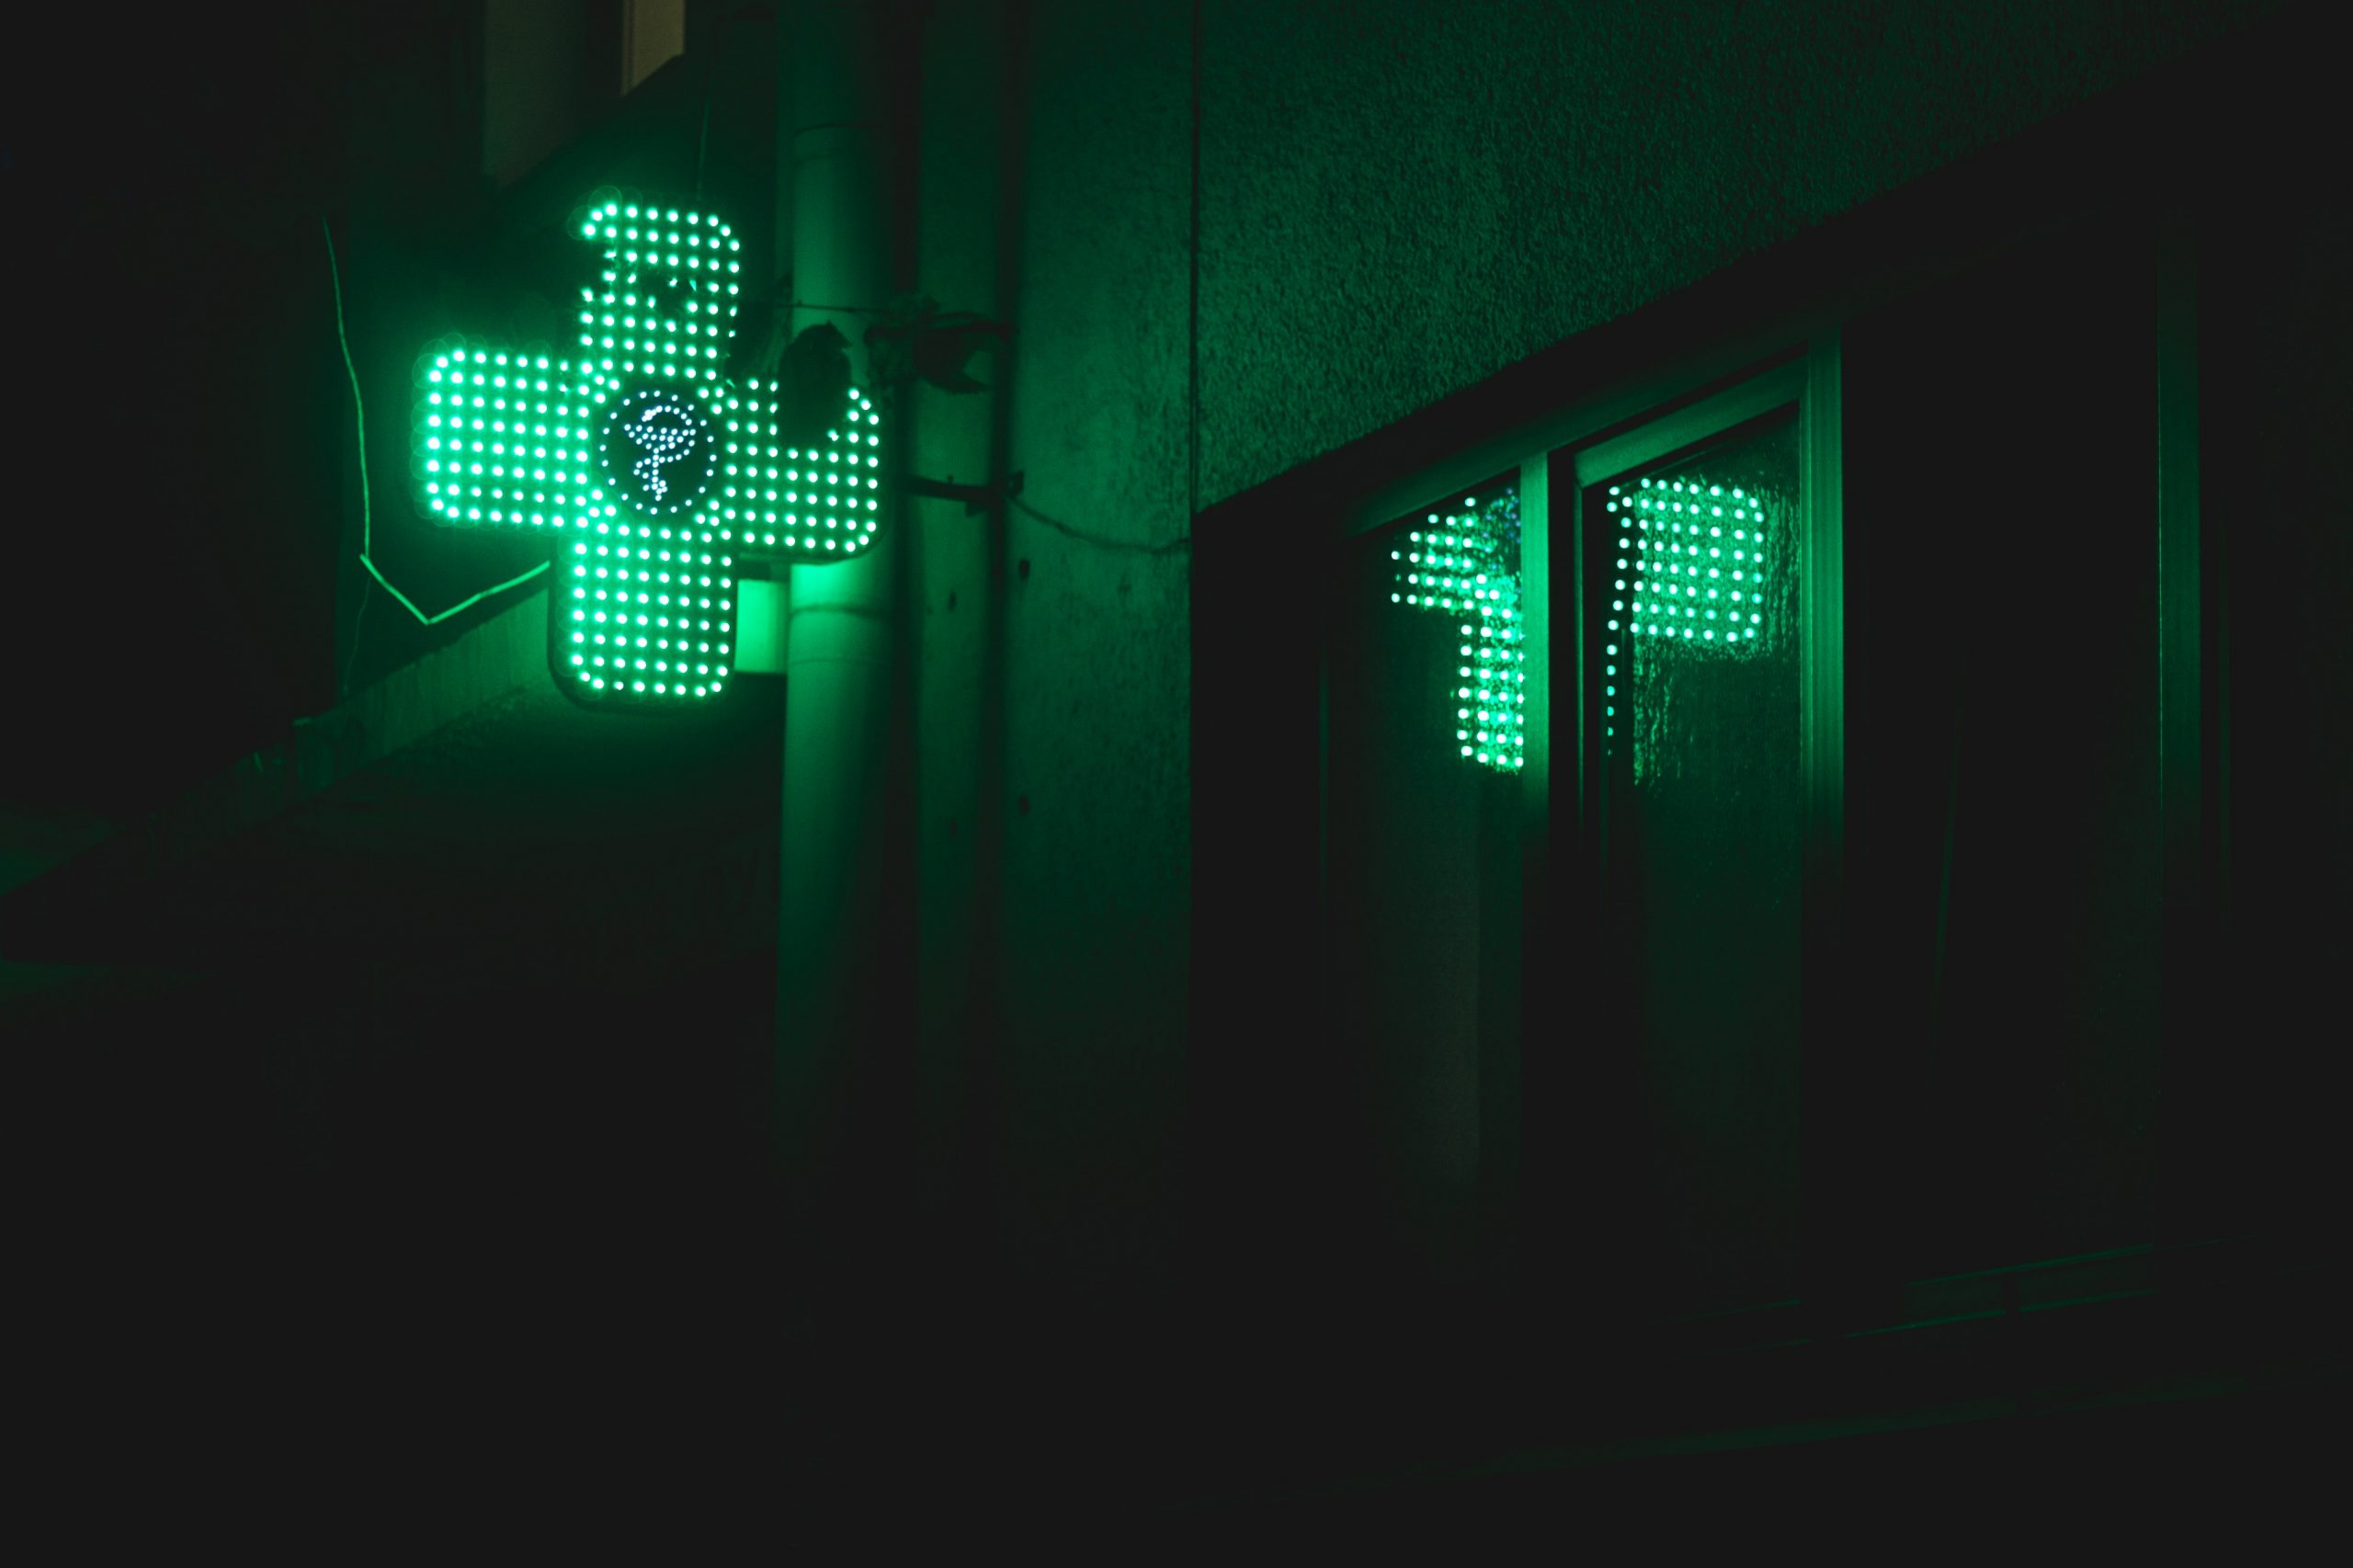 green pharmacy symbol in the shape of a cross is alight on a dark night